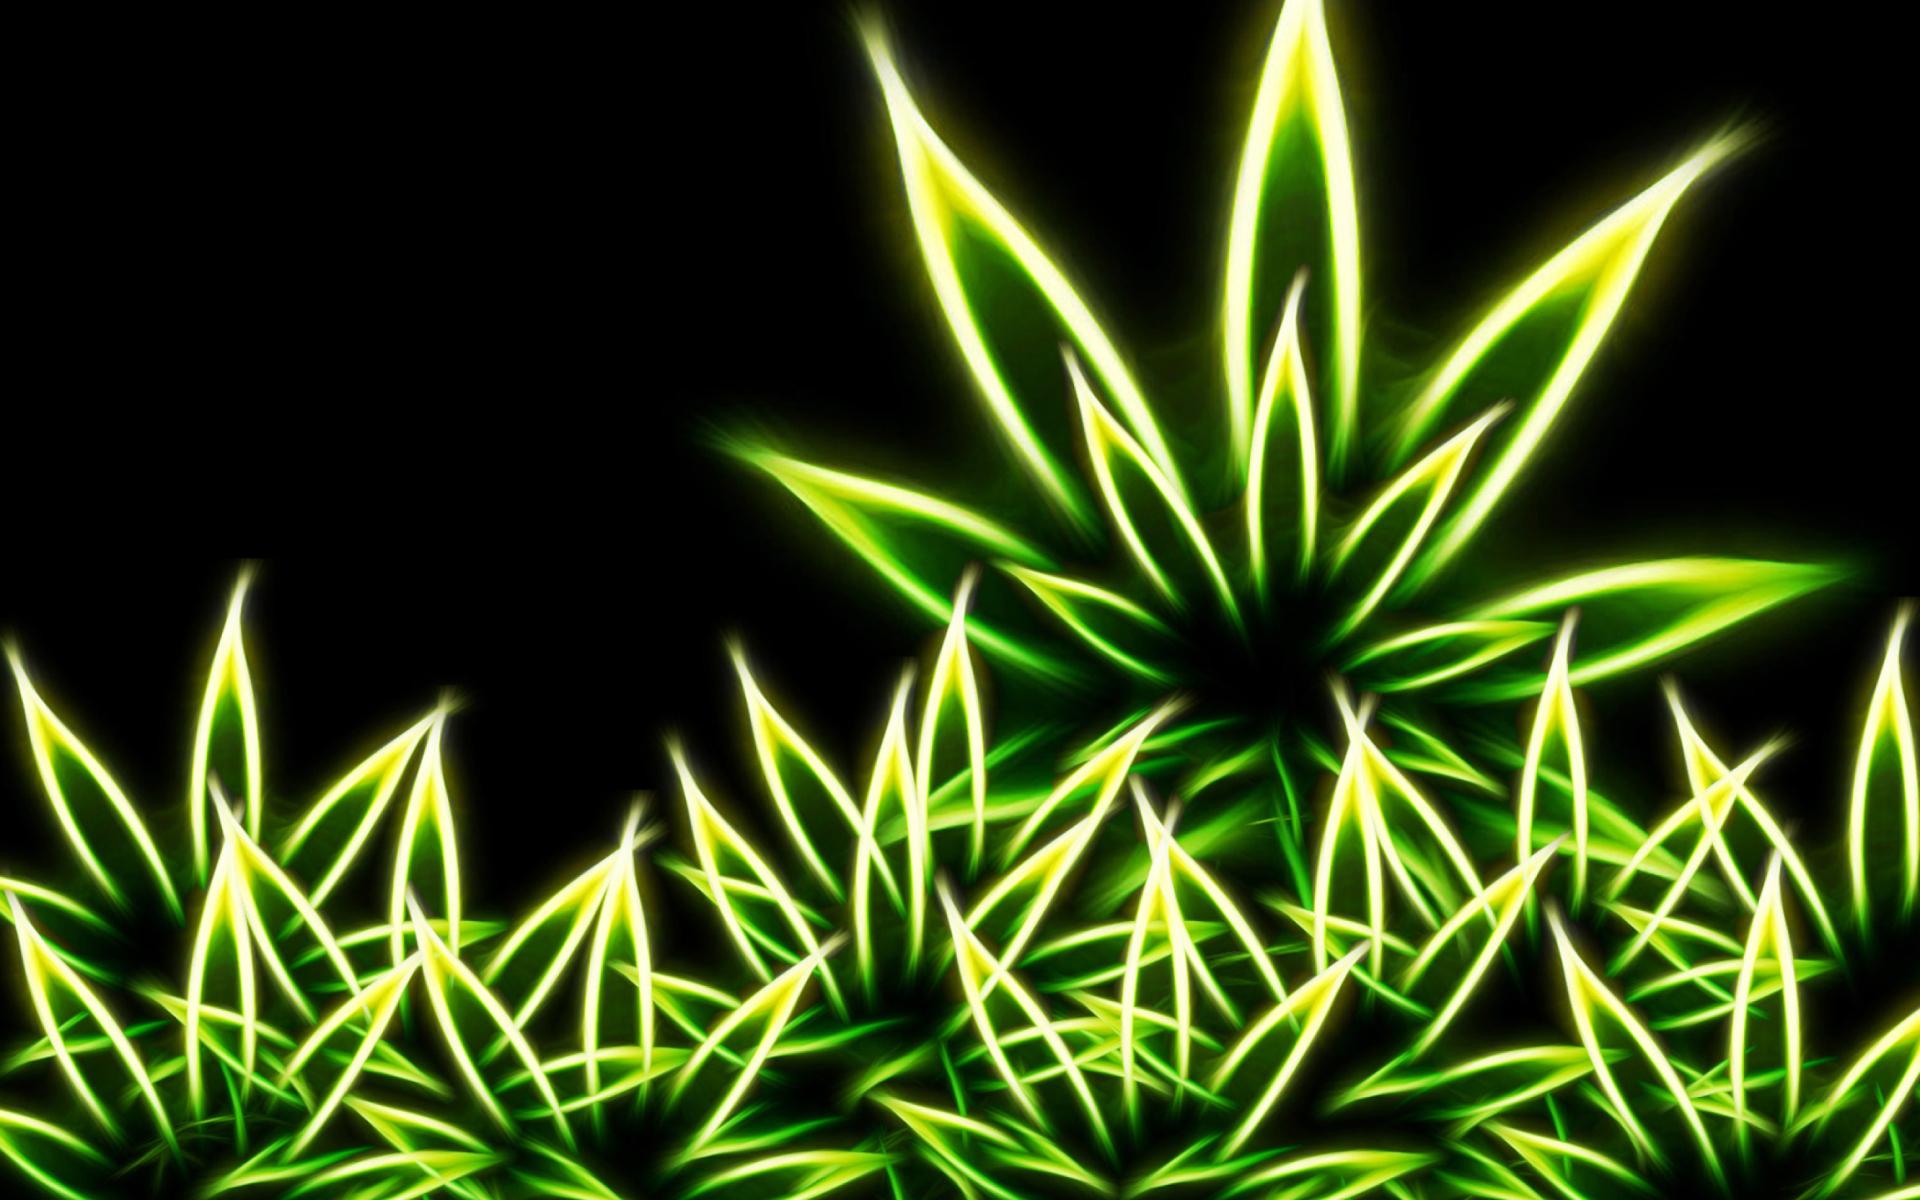 marijuana wallpaper for widescreen desktop pc 1920x1080